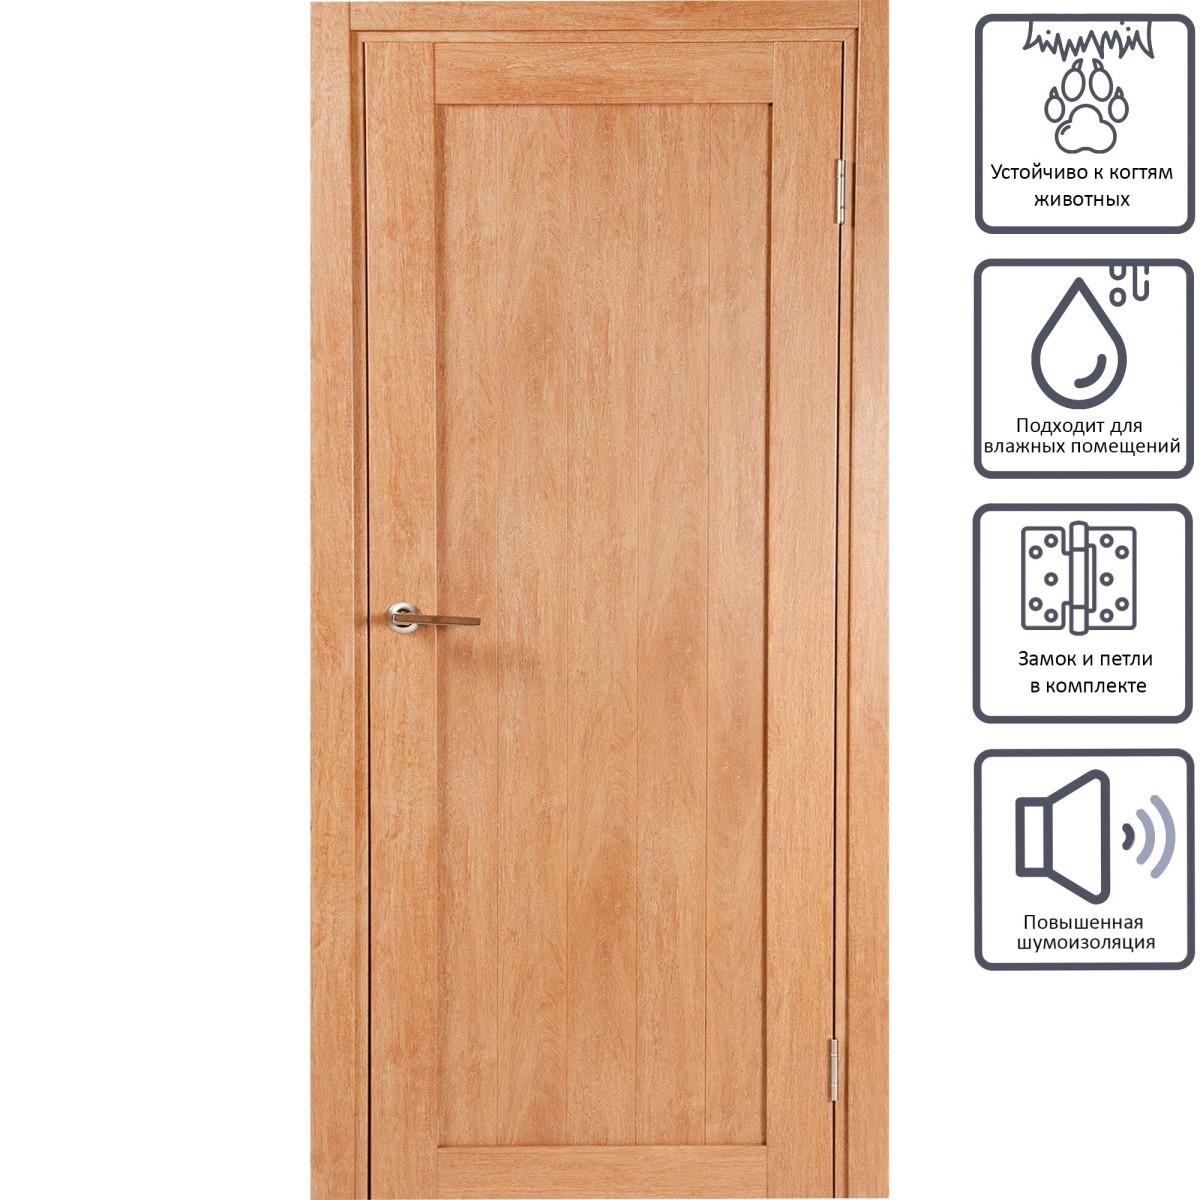 Дверь межкомнатная глухая Кантри 80x200 см ПВХ цвет дуб арагон с фурнитурой